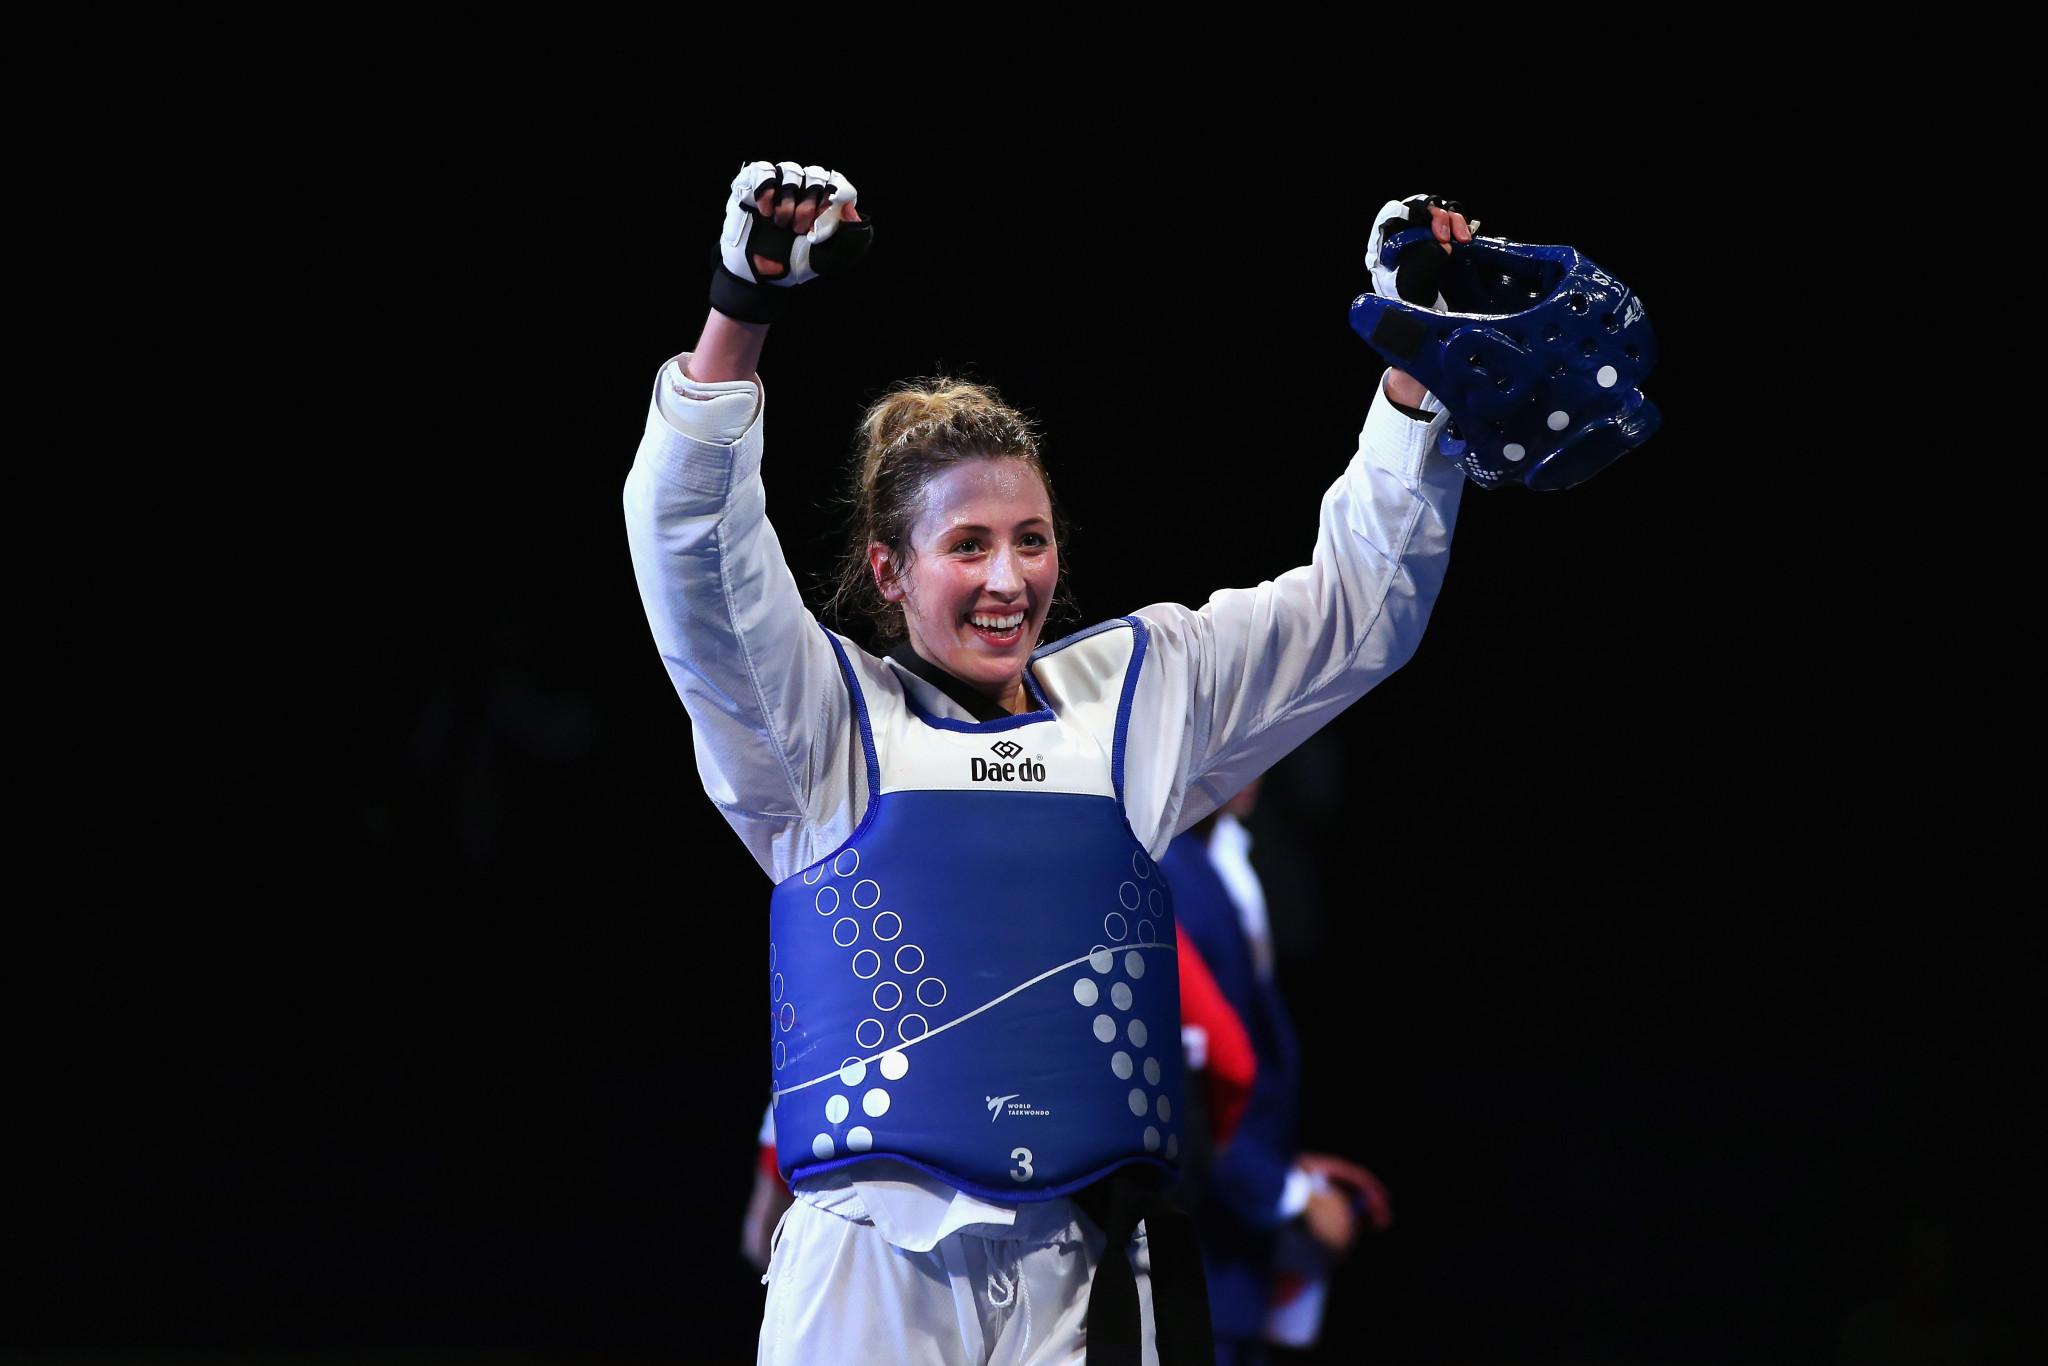 Jones upsets home crowd on quarter-finals day at World Taekwondo Grand Slam Champions Series